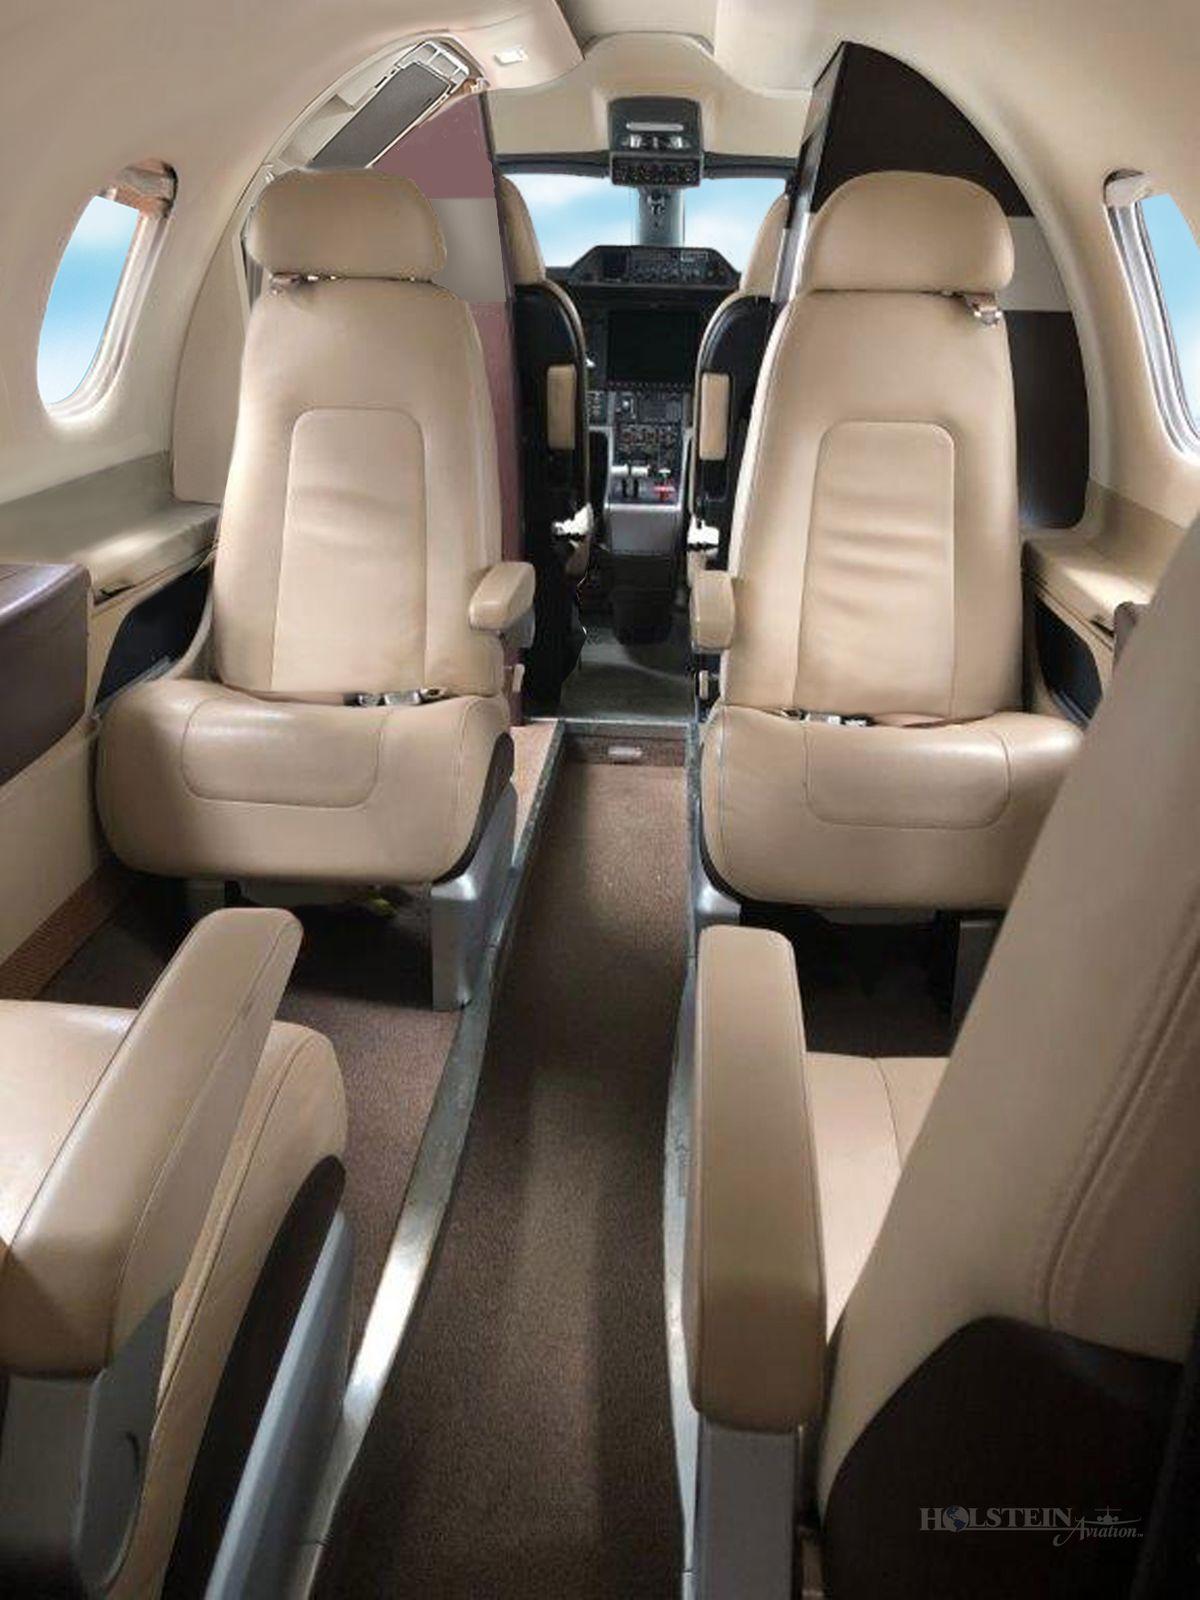 2013 Embraer Phenom 100 - SN 50000306 - VH-LWZ - Int - Aft Fac Fwd RGB.jpg